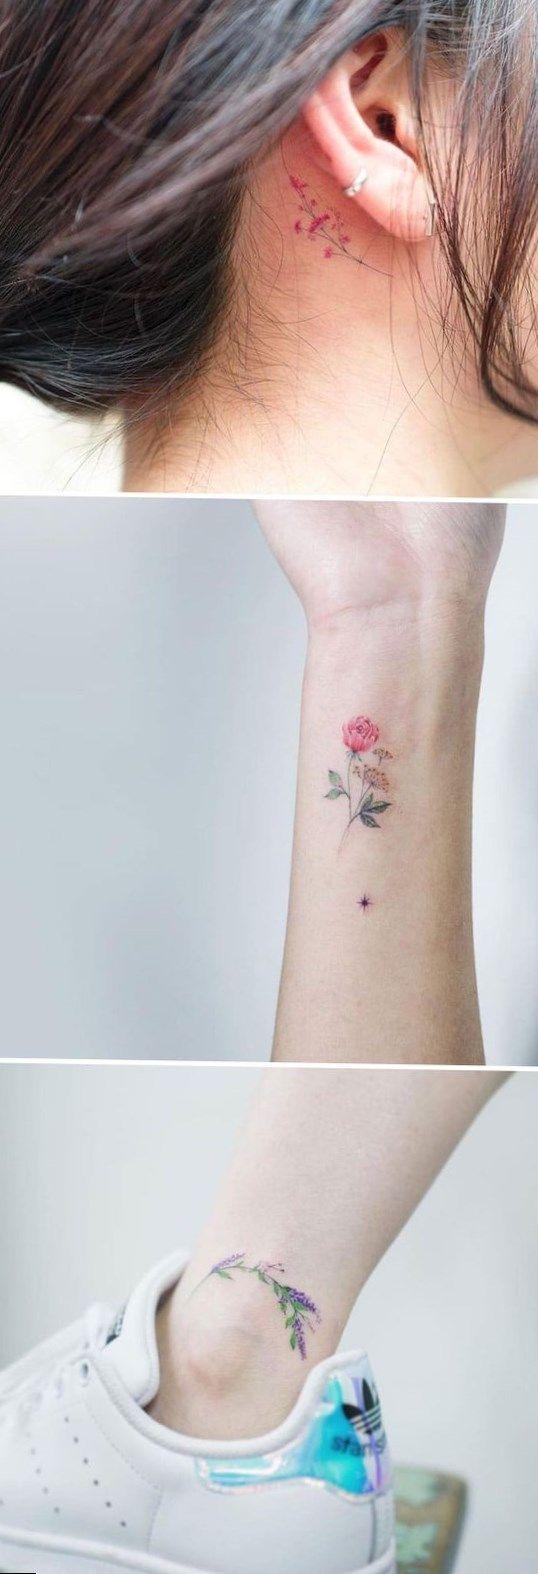 25+ Best Ideas About Girl Cross Tattoos On Pinterest